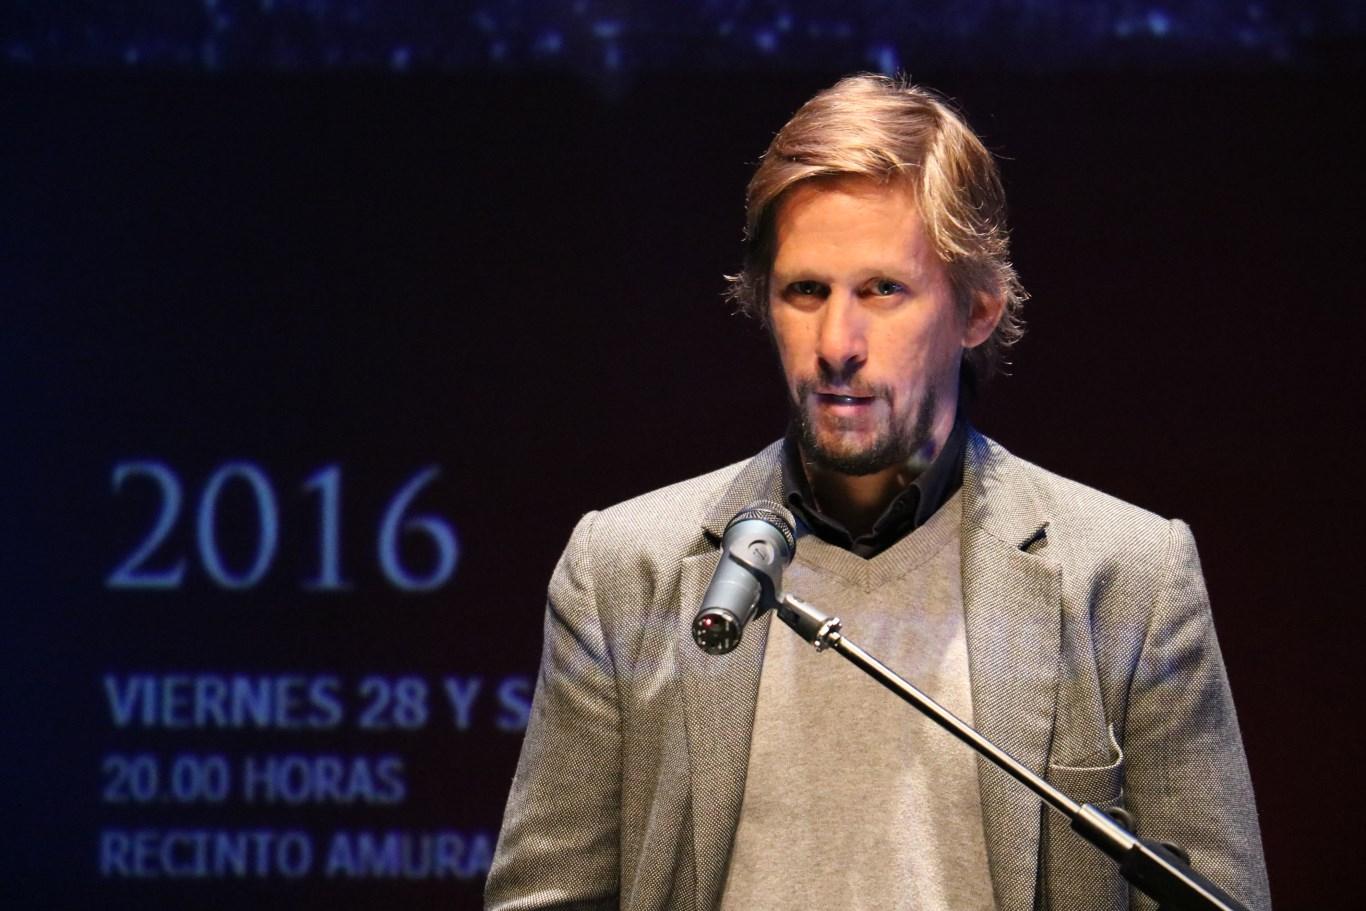 presentacion-don-juan-en-alcala-2016-22